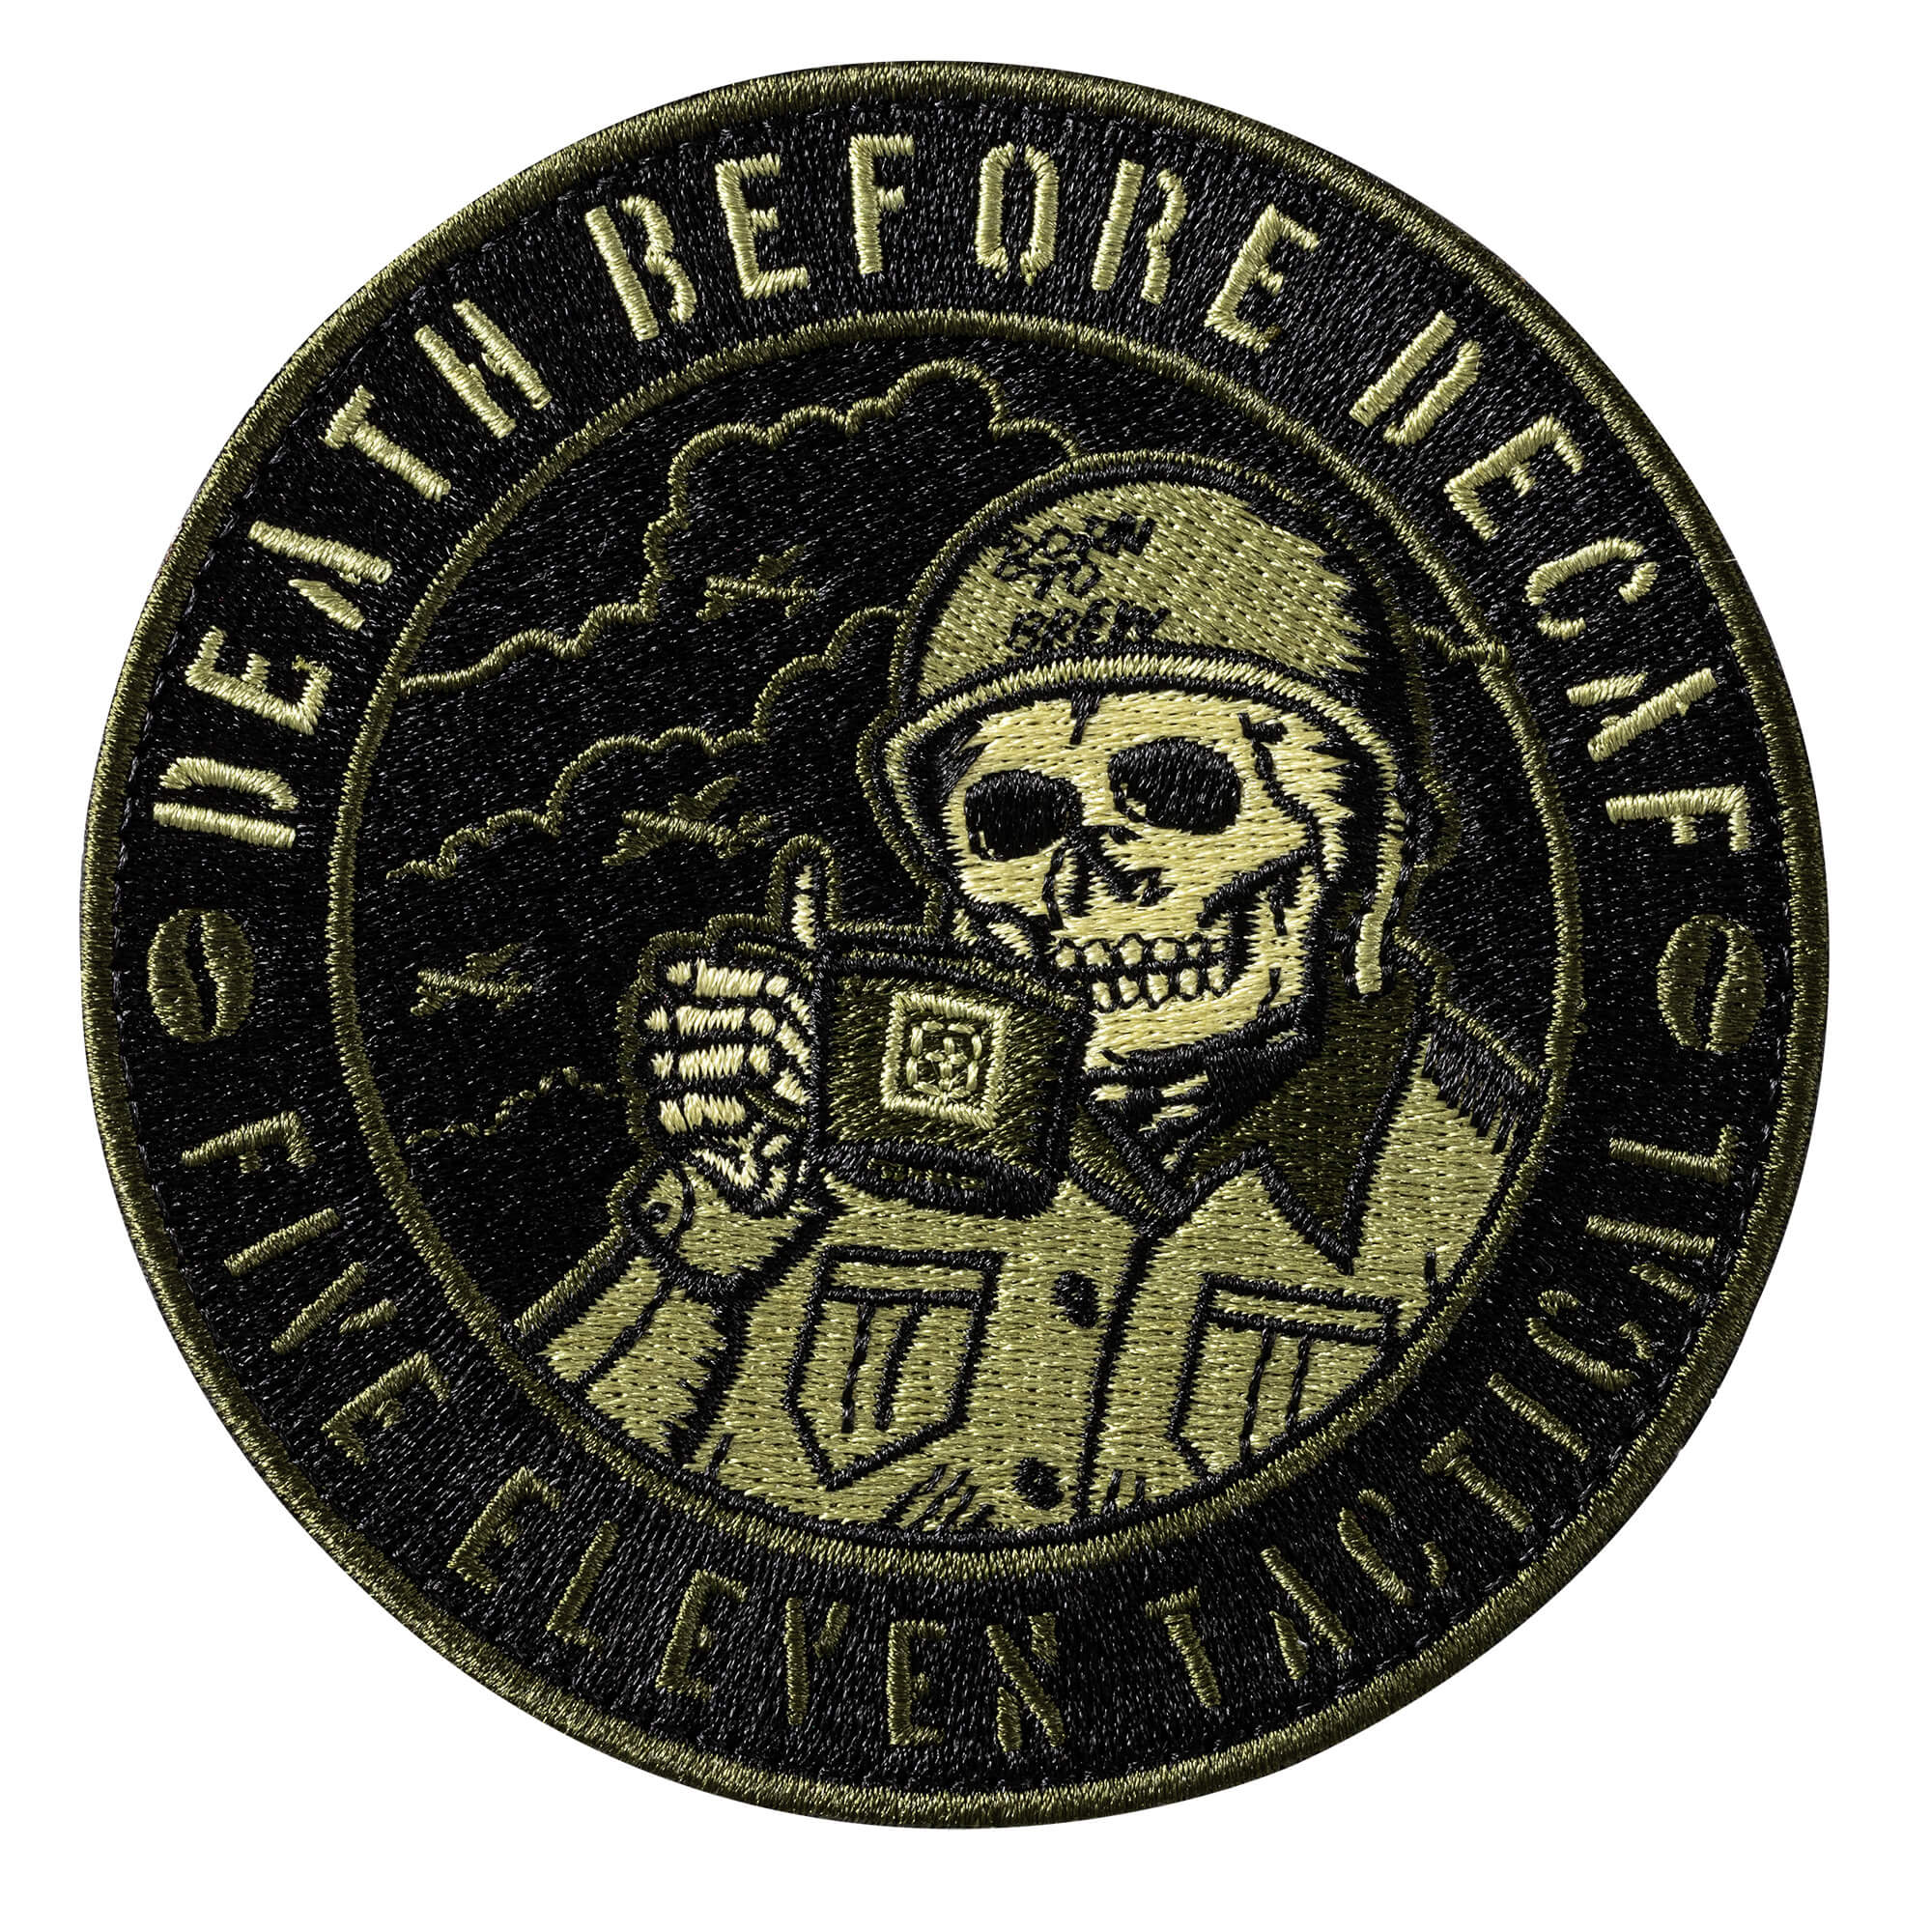 parche world war coffe 511 tactical alcatraz